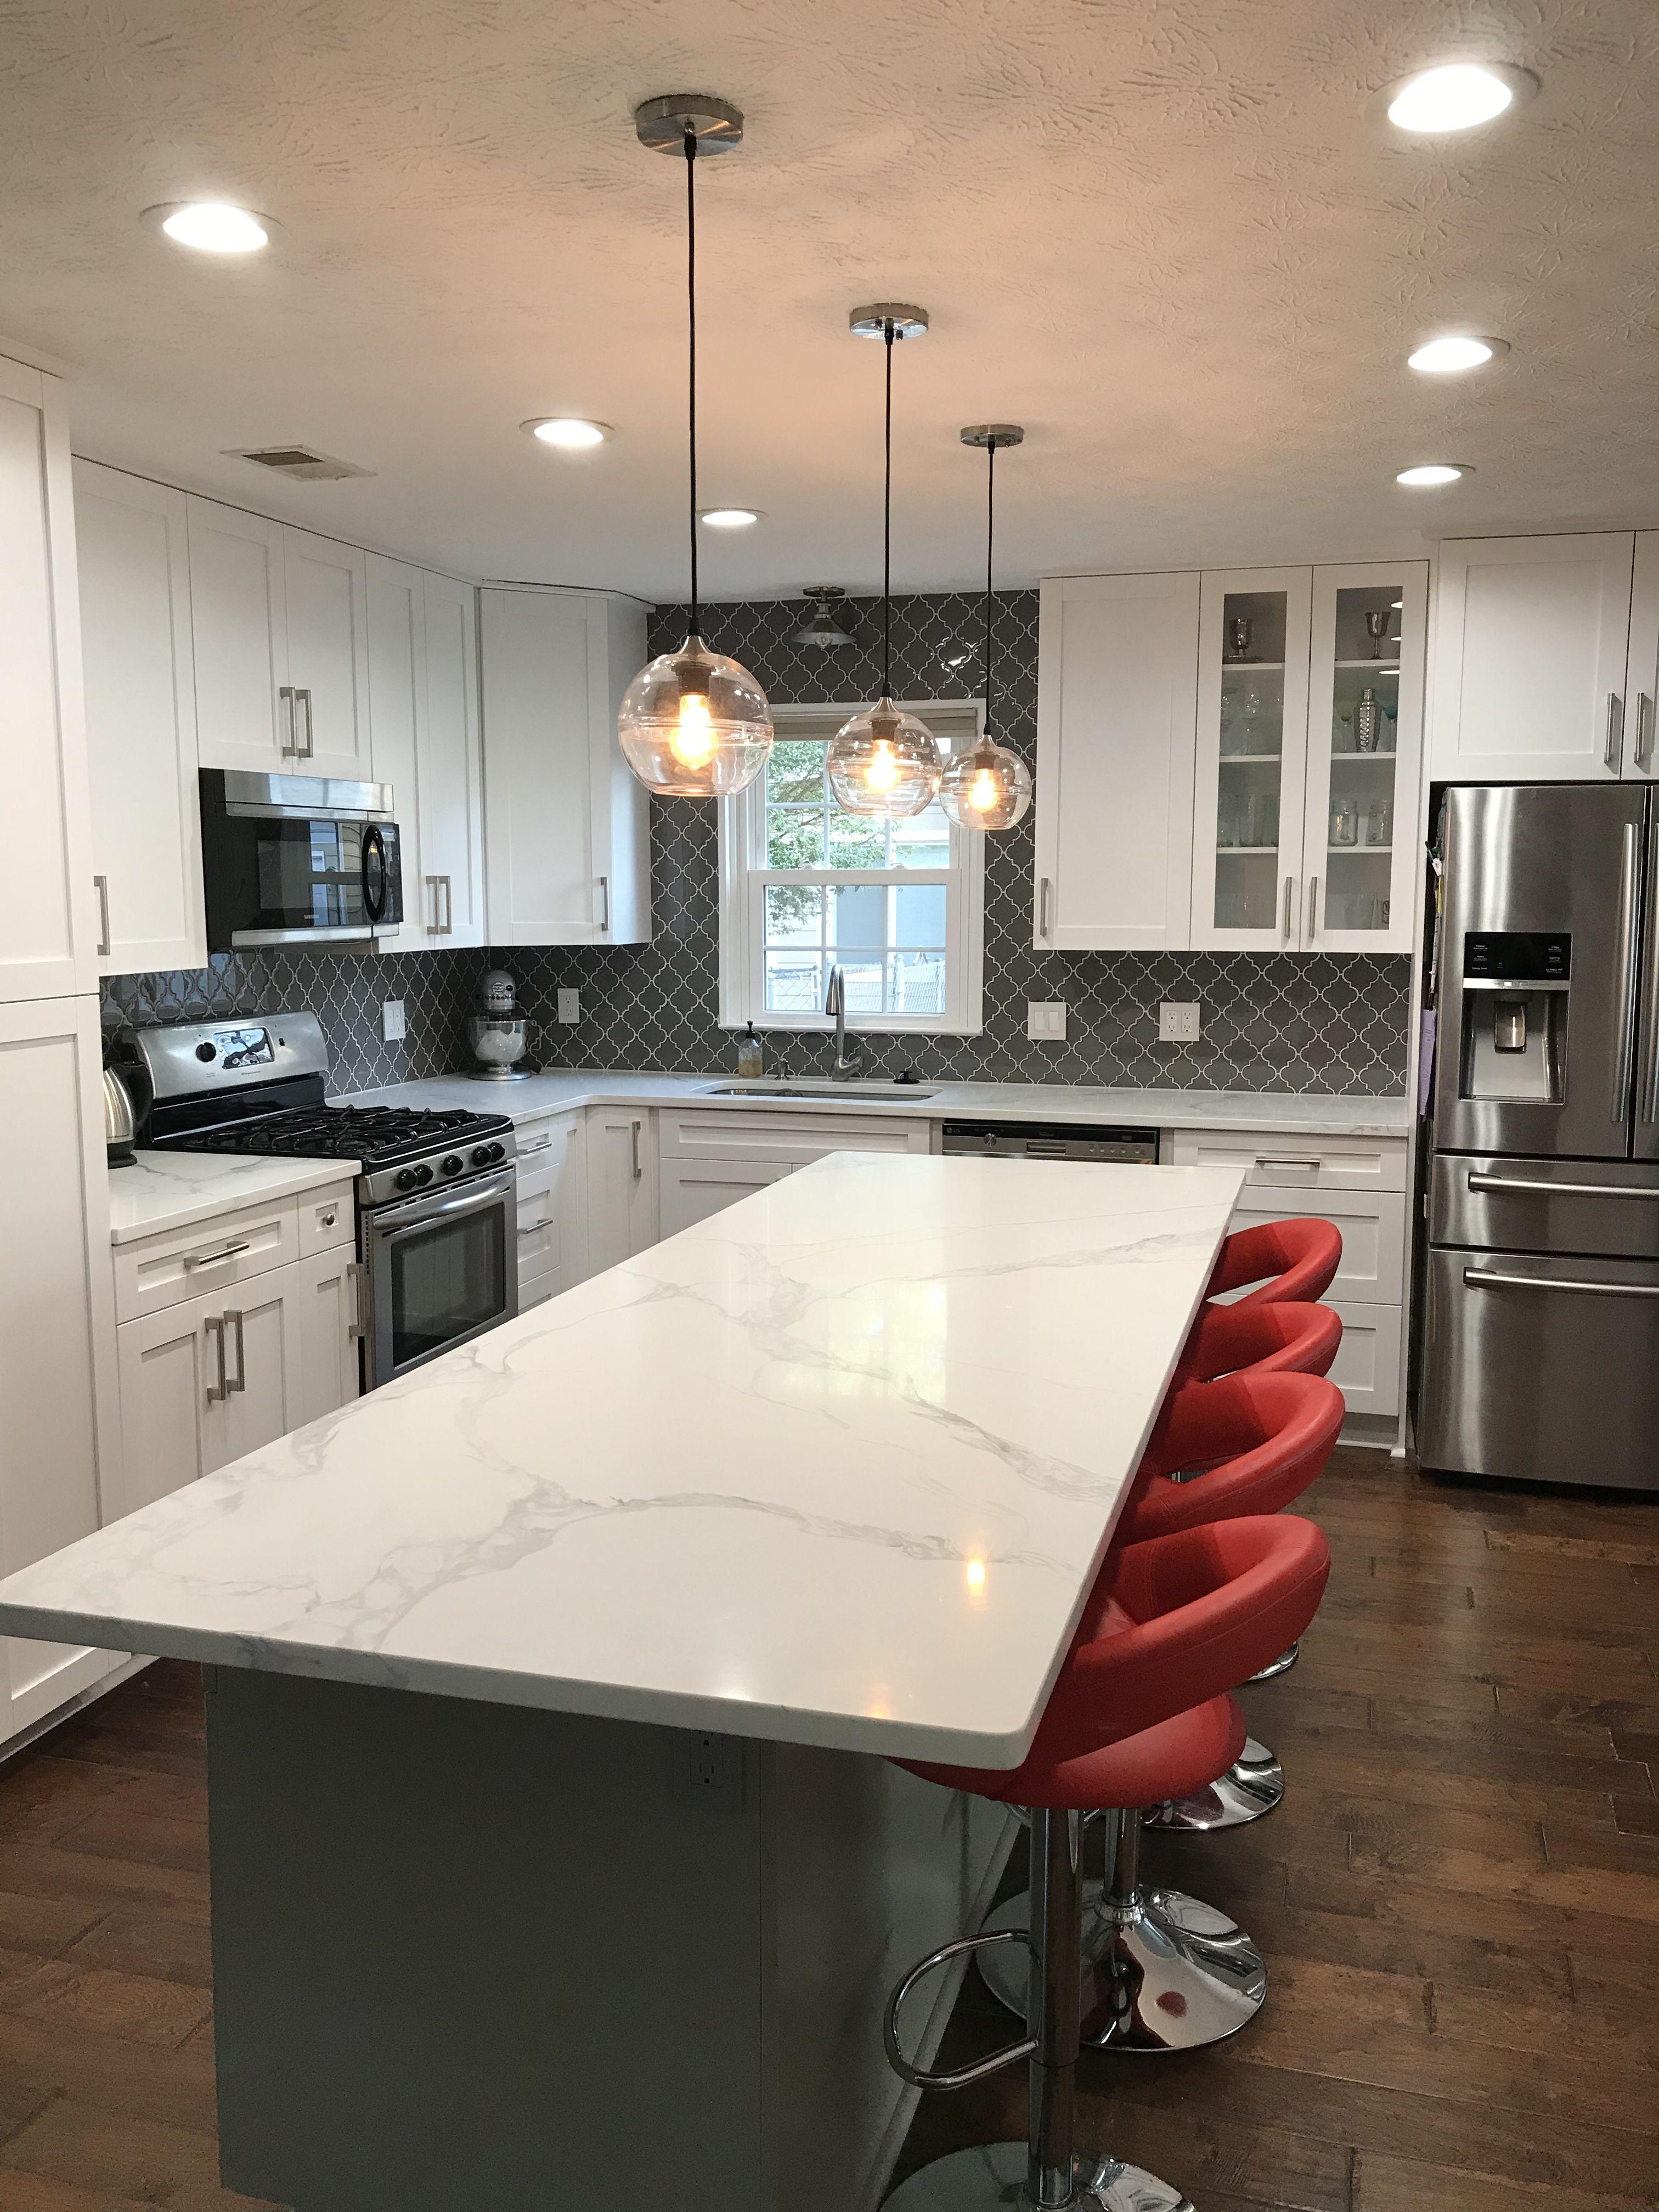 Concrete Countertops With White Cabinets